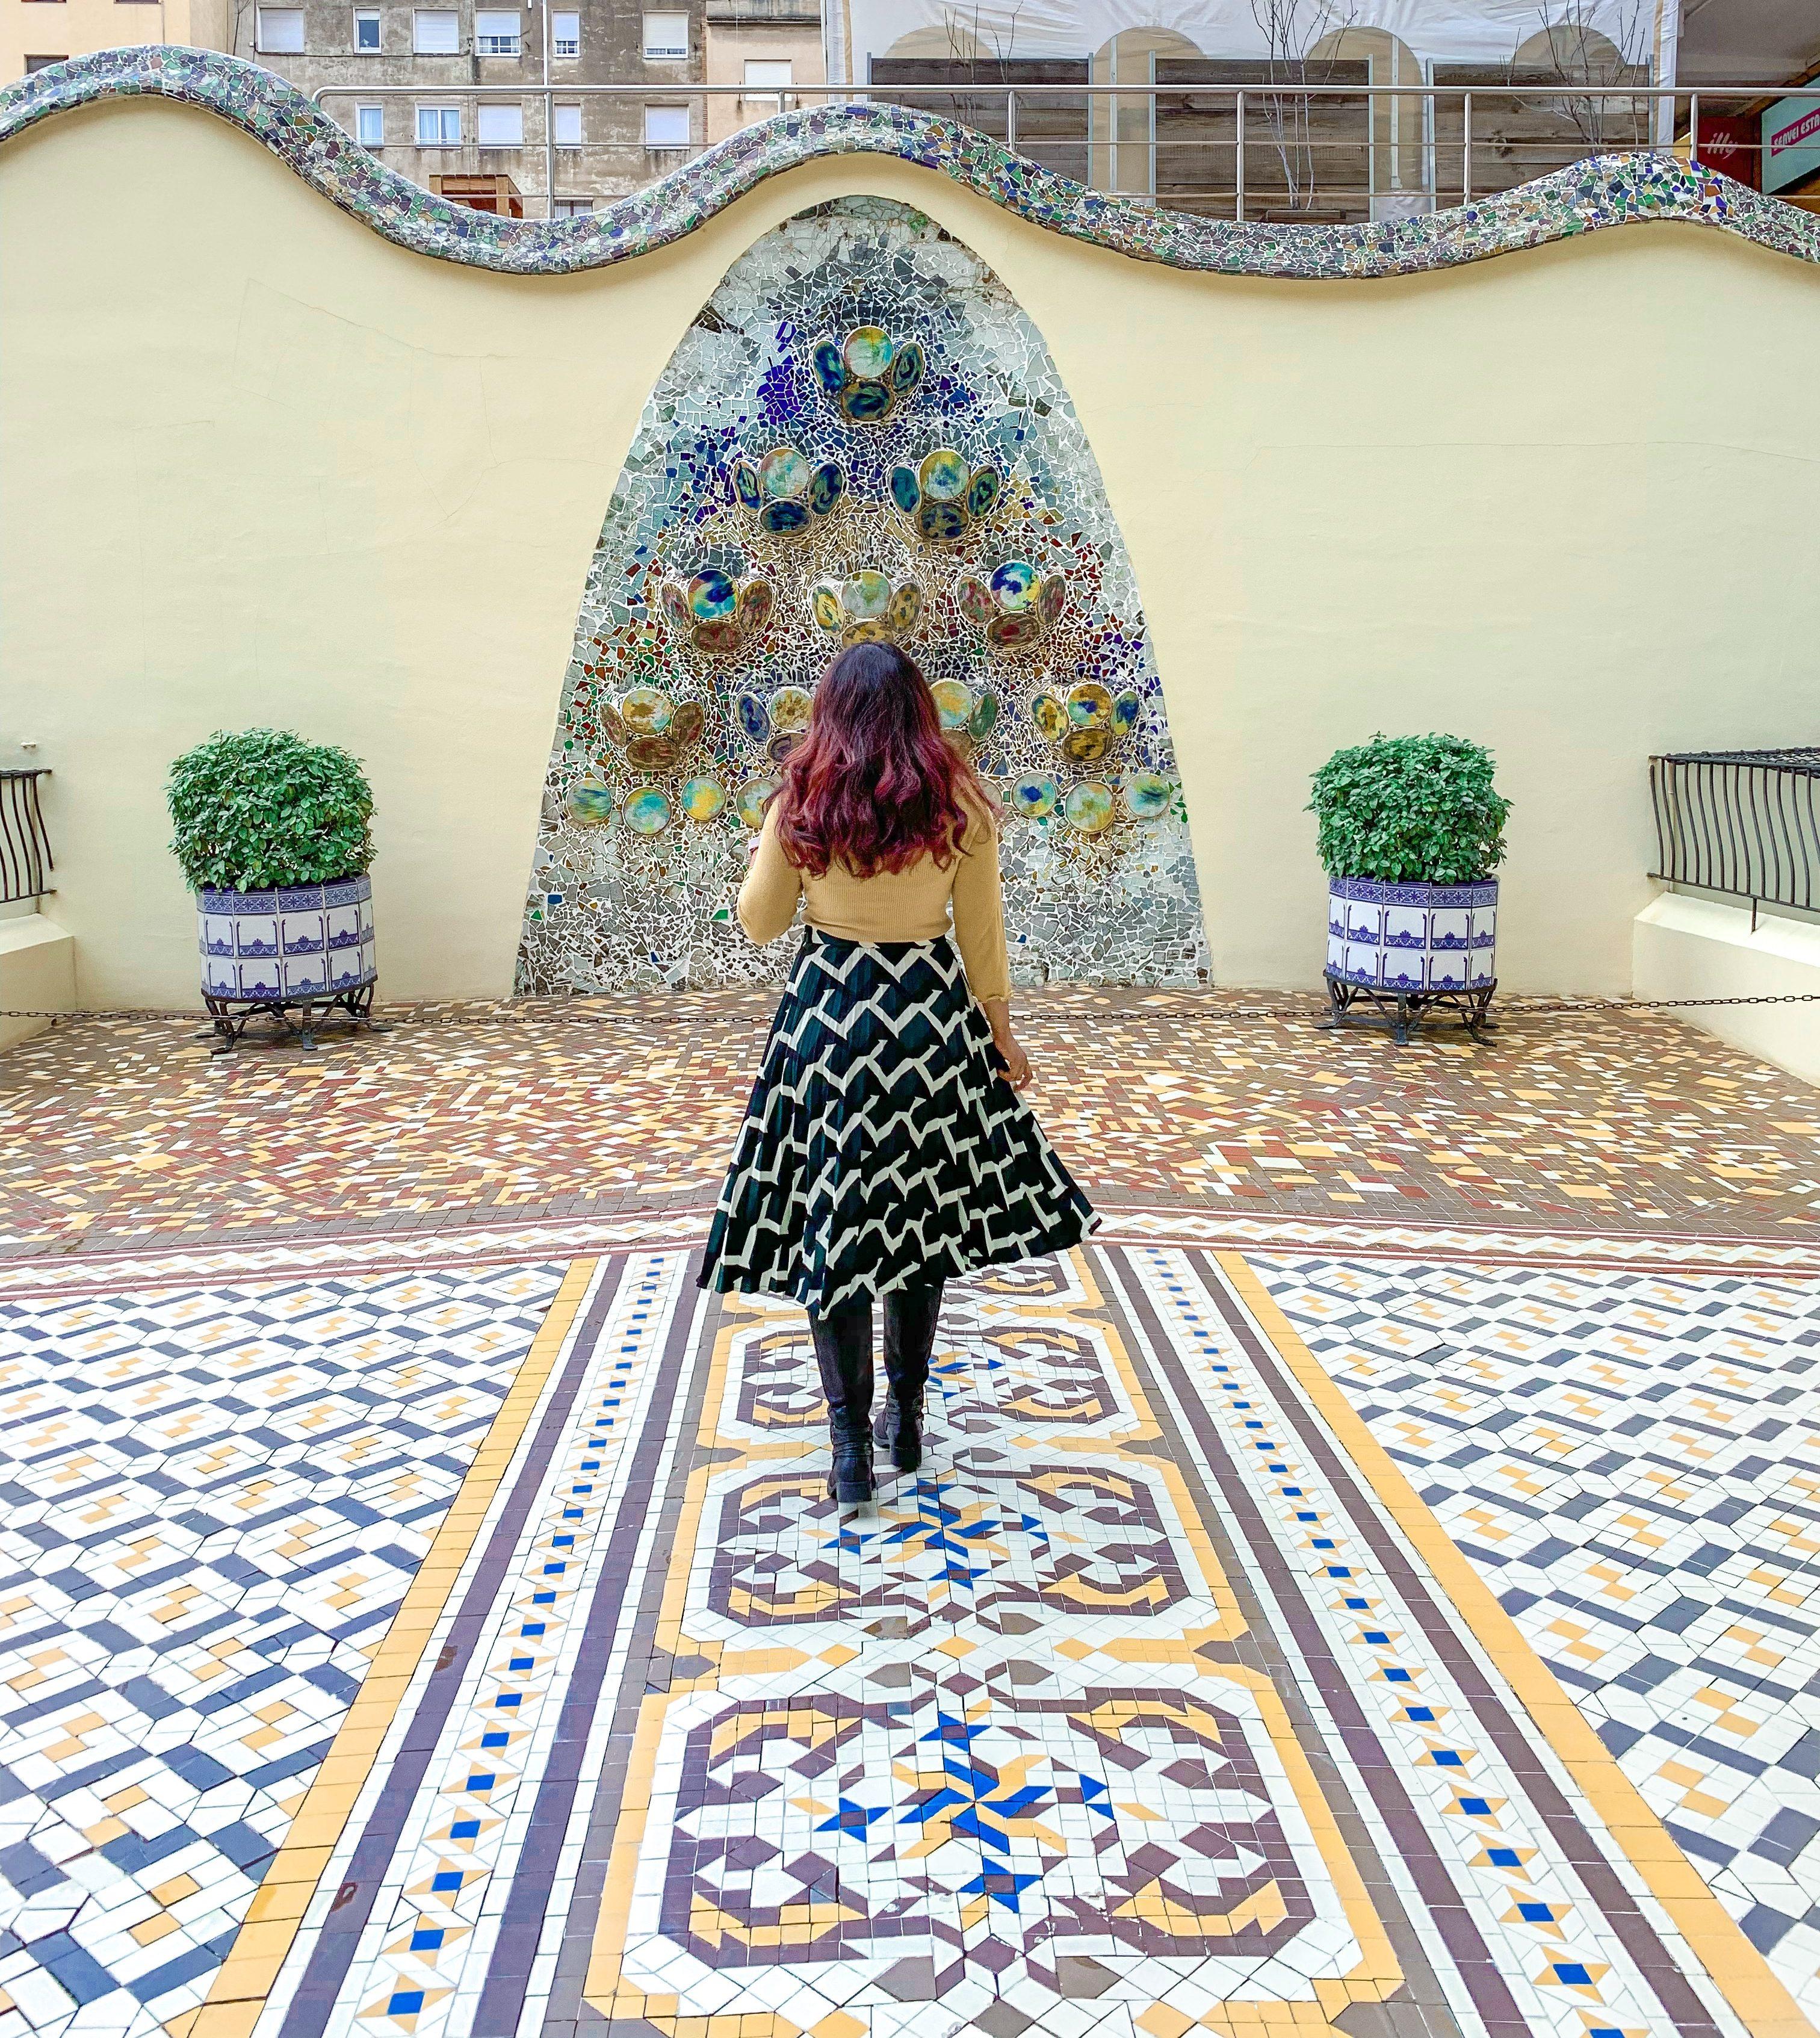 Casa Batllo inside